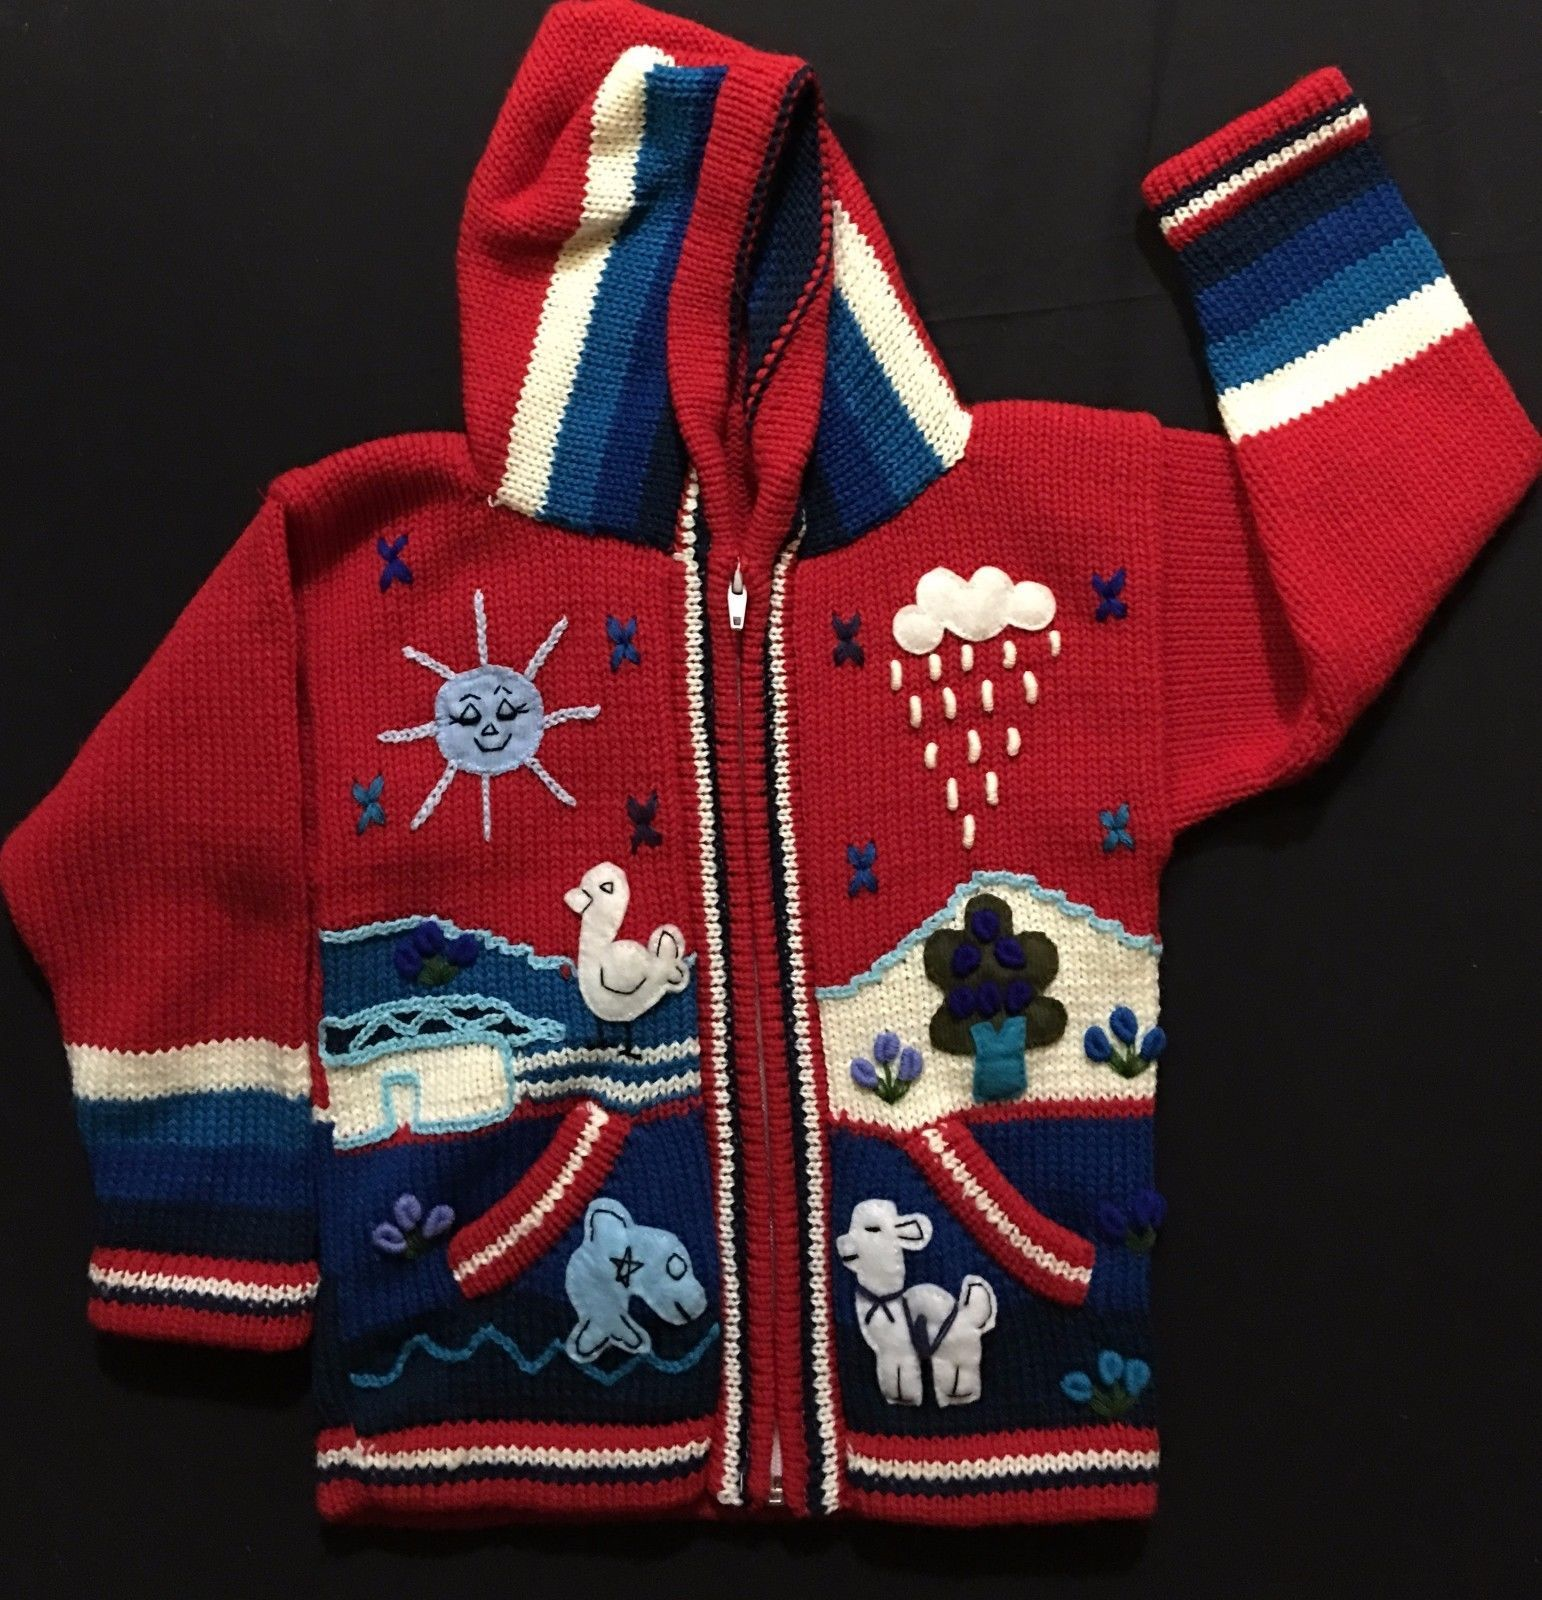 Child/'s Arpillera Handmade Peruvian Sweater From Peru Pink 3T